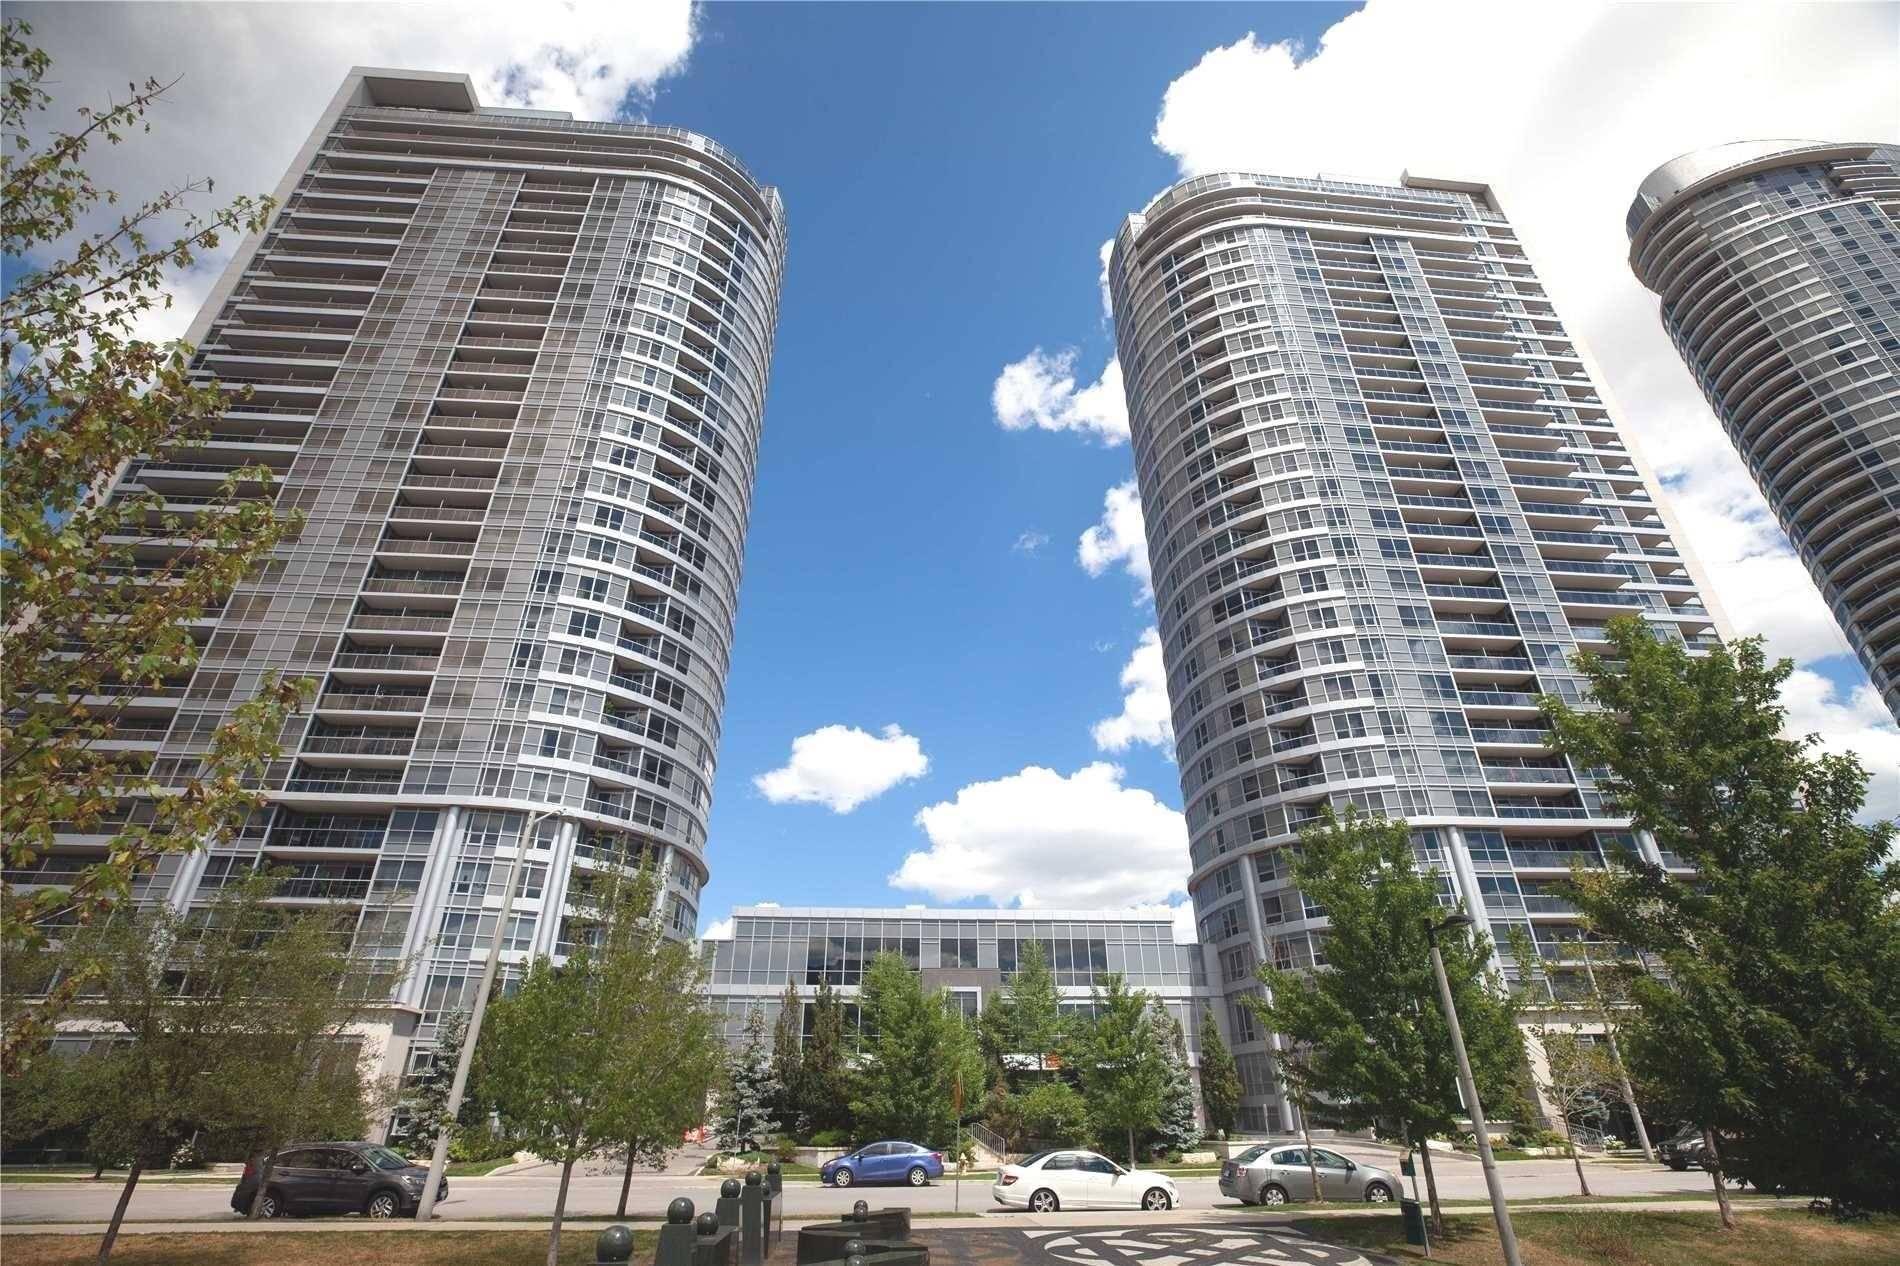 Ventus Ii At Metrogate Condos Condos: 181 Village Green Square, Toronto, ON